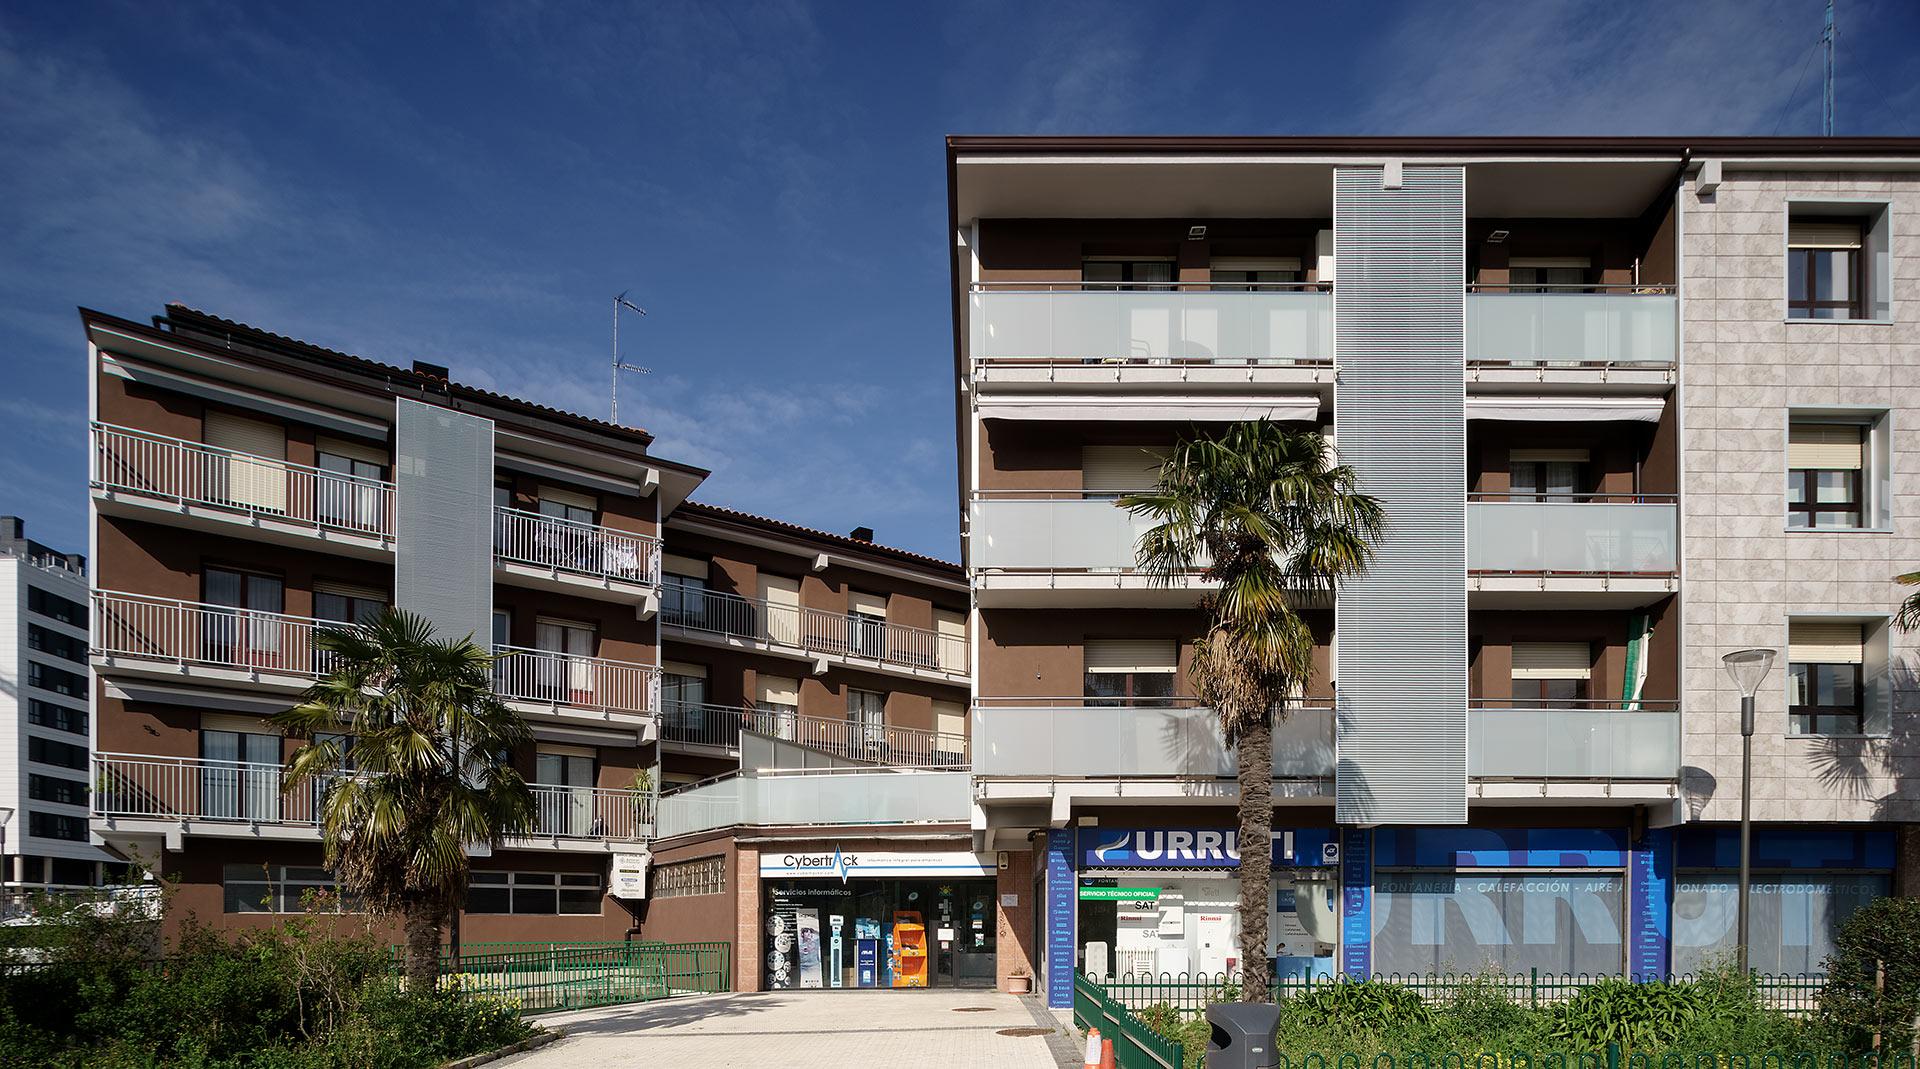 Rehabilitacion-energetica-fachada_aislamiento_District-Heating_BASA-Arquitectura_San-Sebastian-Donosti_3_b